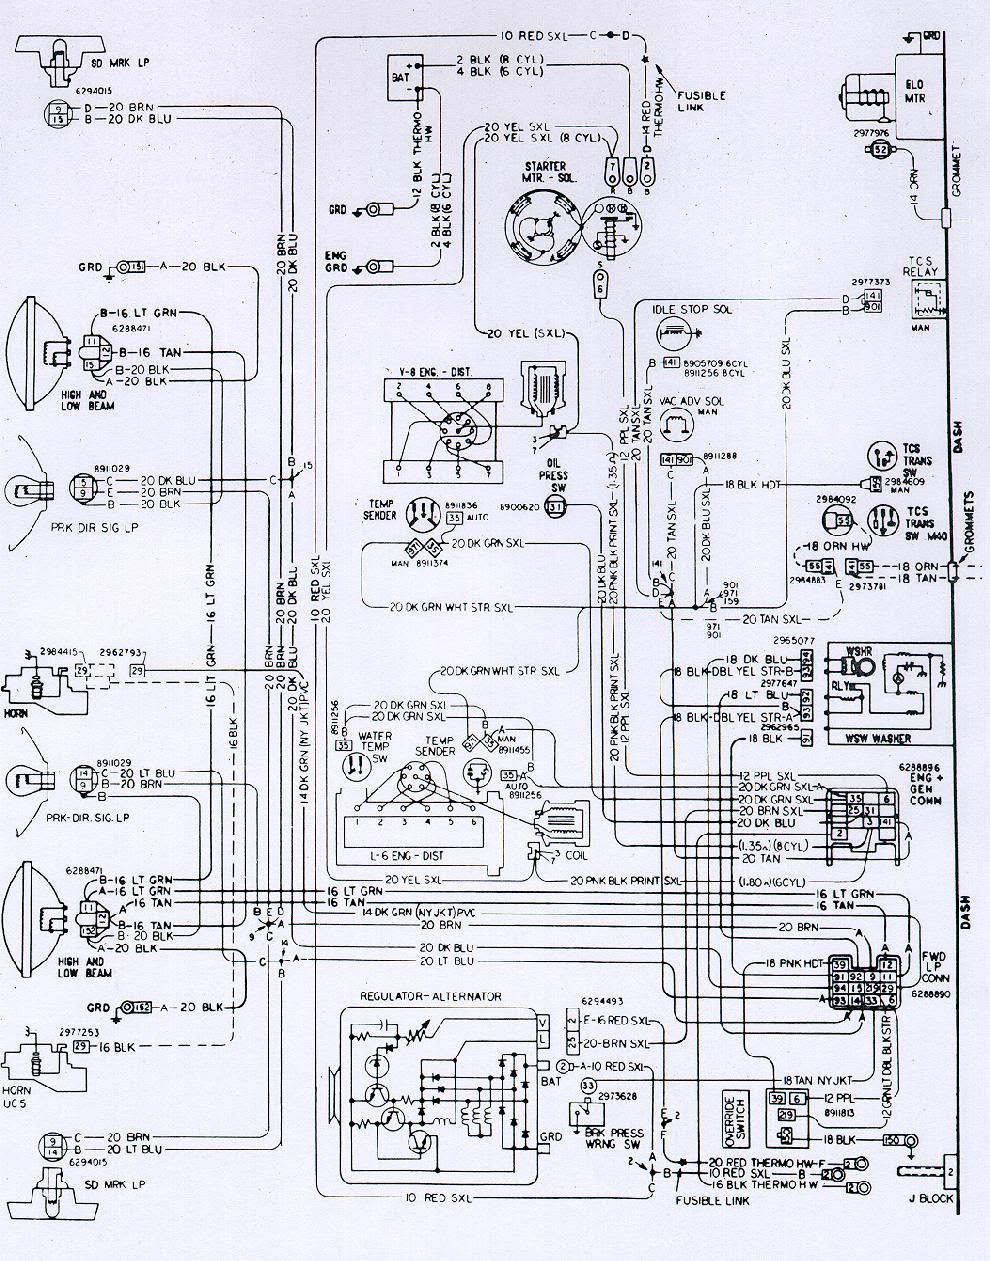 Wiring Diagrams For 1971 Camaro Wiring Diagram Instruct Instruct Cfcarsnoleggio It